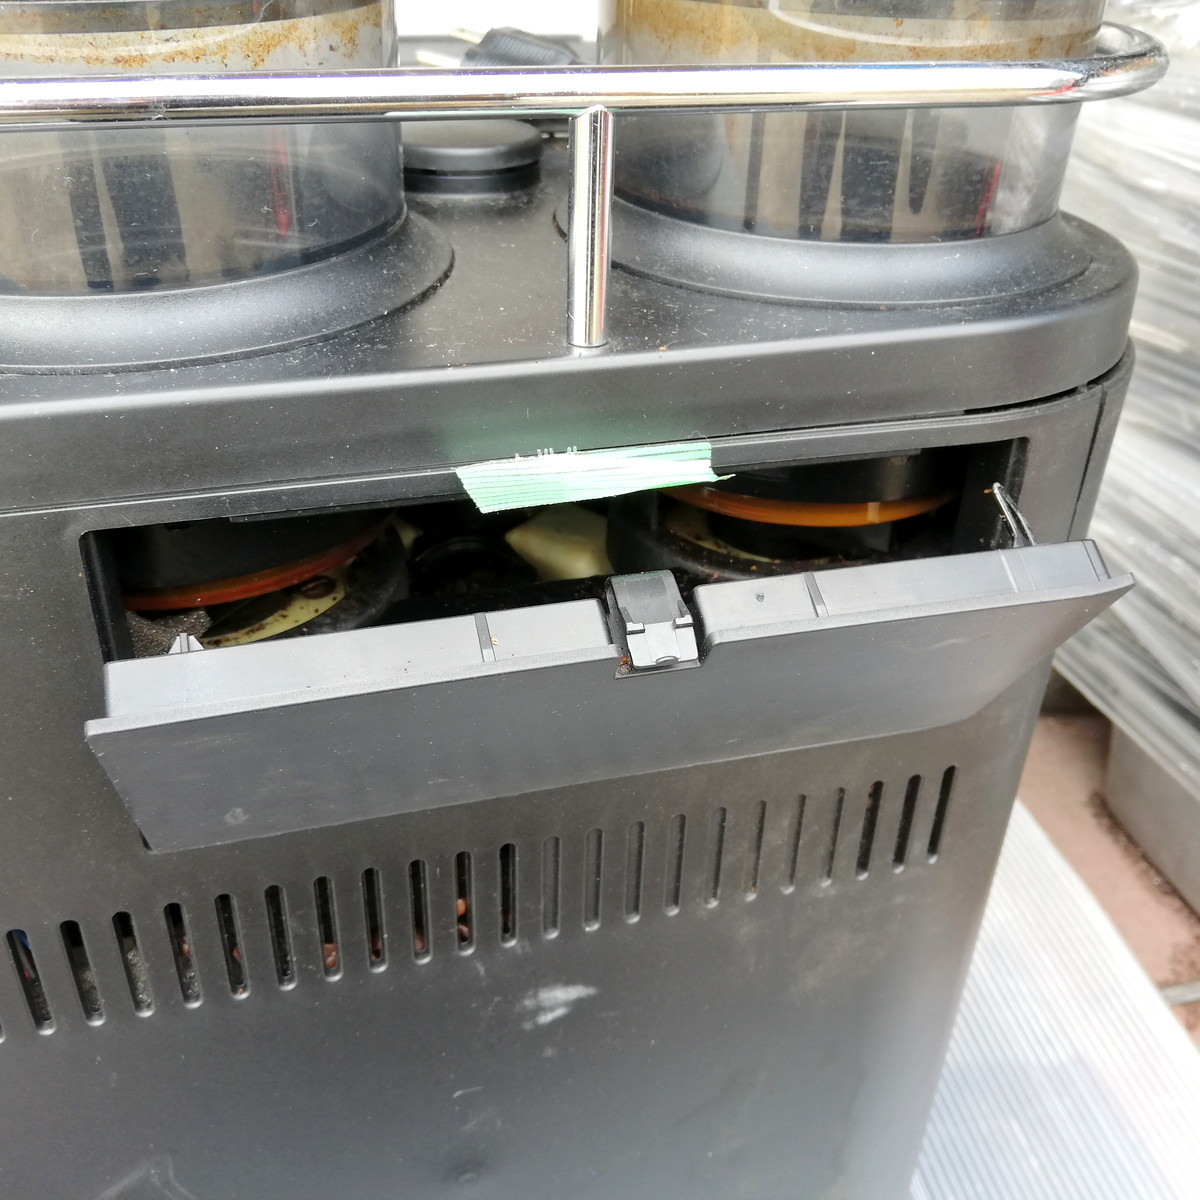 FR-1◆FRANKE フランケ Typ654 エスプレッソマシン 100V 通電確認済 コーヒーマシン / BONMAC BM-FAF1 ★引取歓迎(大阪)_画像8